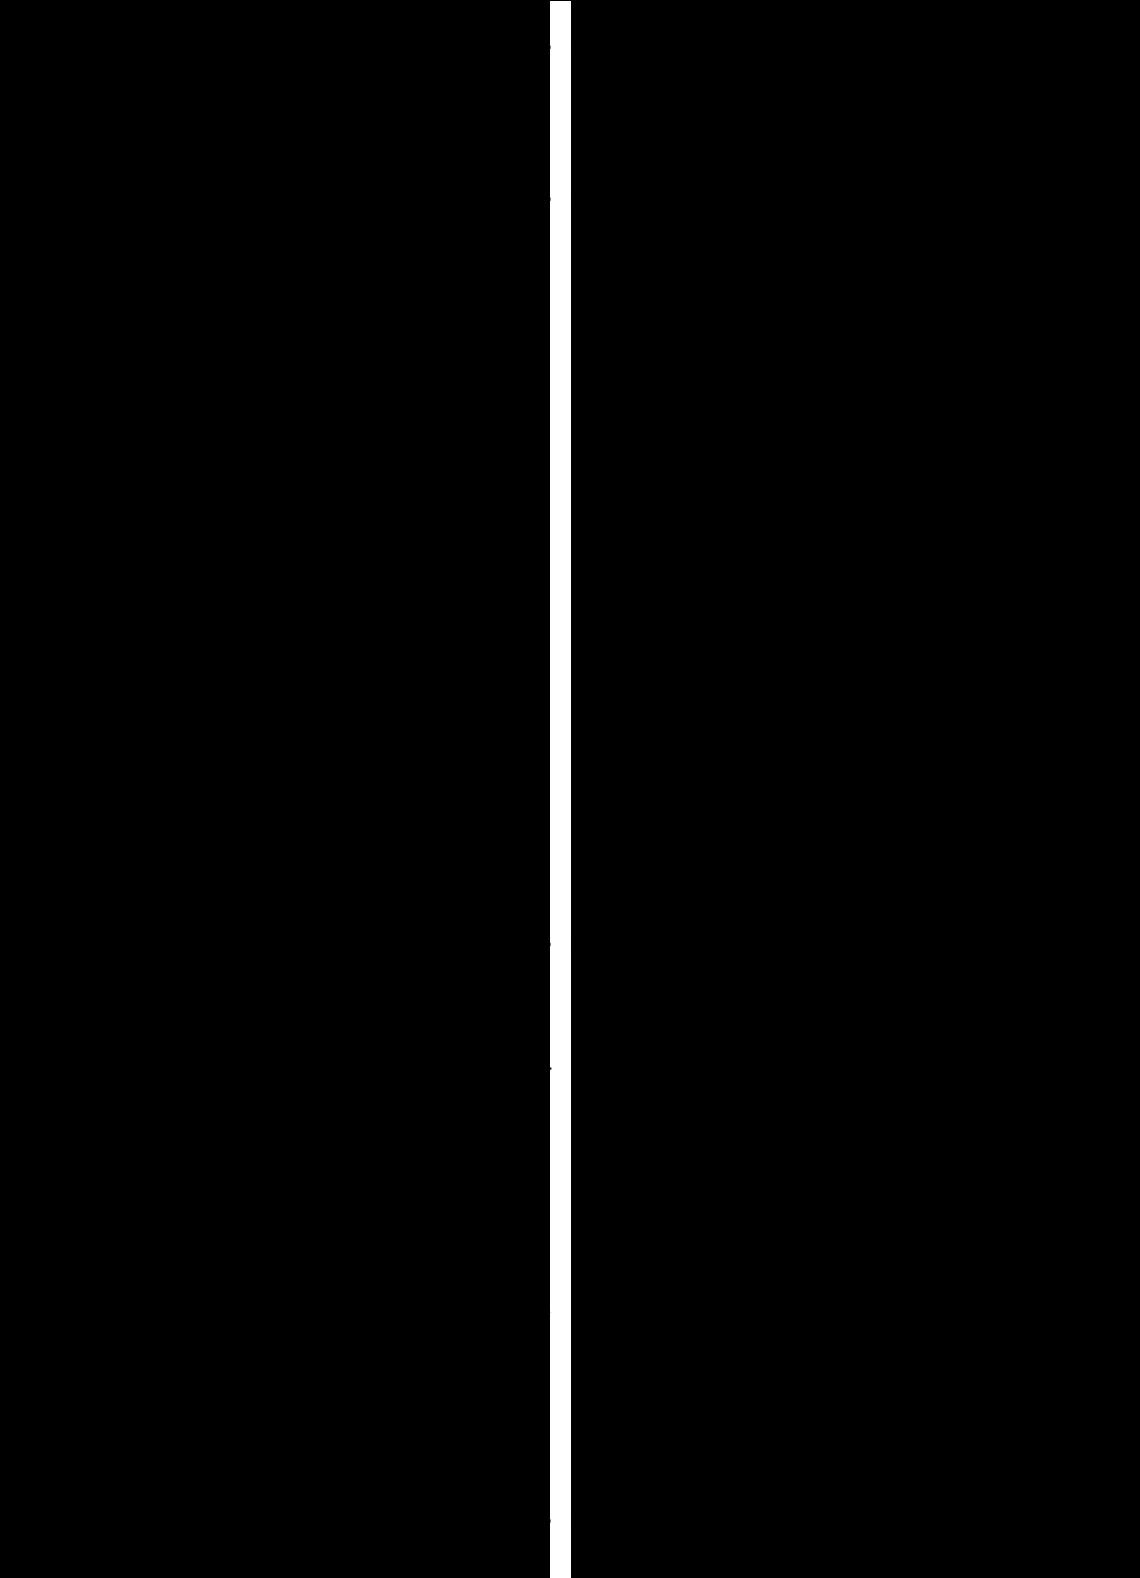 29LT-Zarid-Text-Image-21